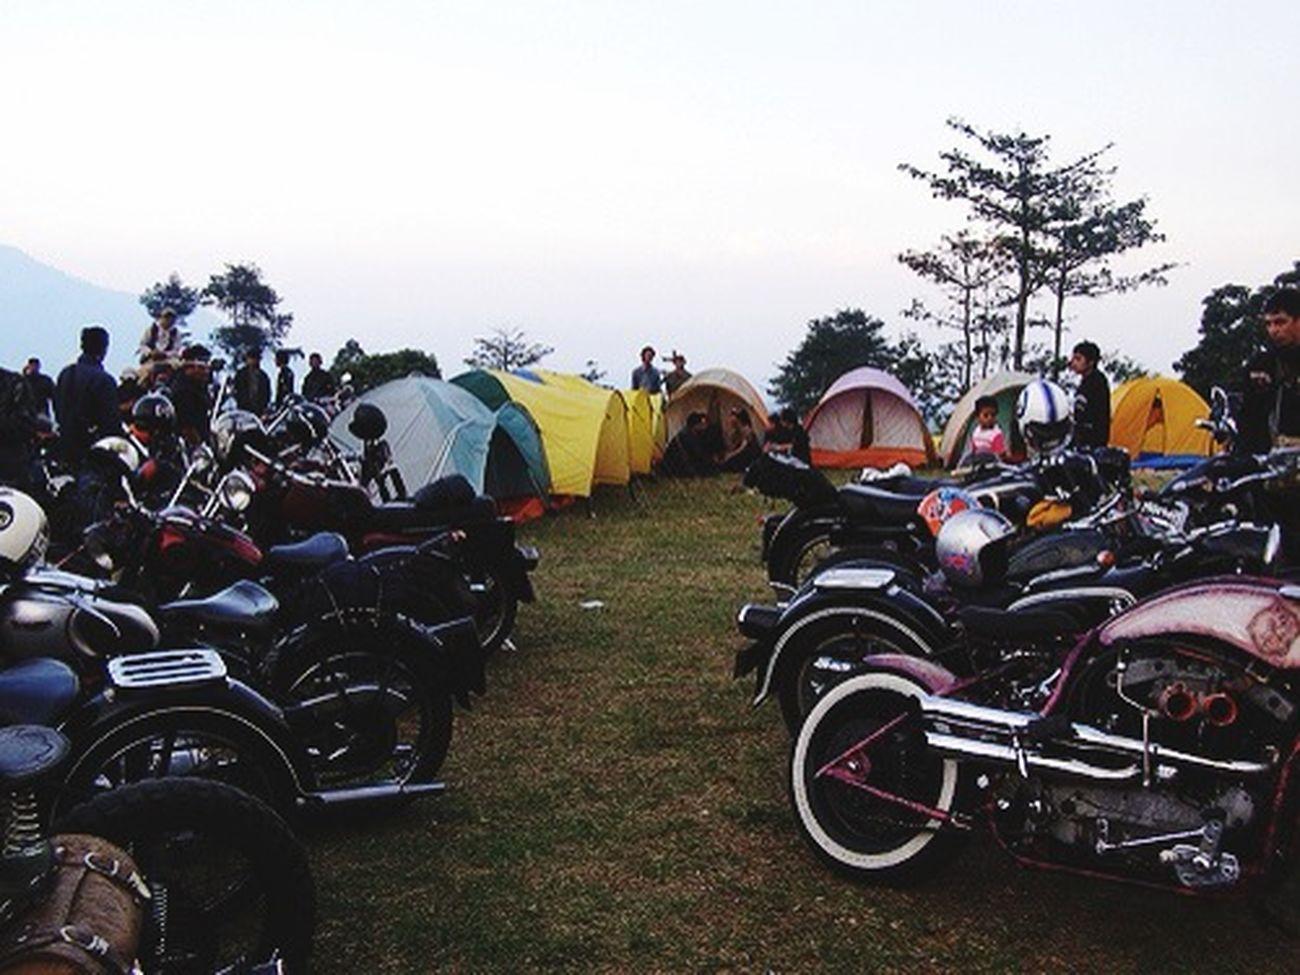 Bikers Brotherhood Mc Camping Classic Motorcycles Bandung, West Java Motorcycle Club 1% Brotherhood Forever Forever Brotherhood Hello World Enjoying Life Great Atmosphere